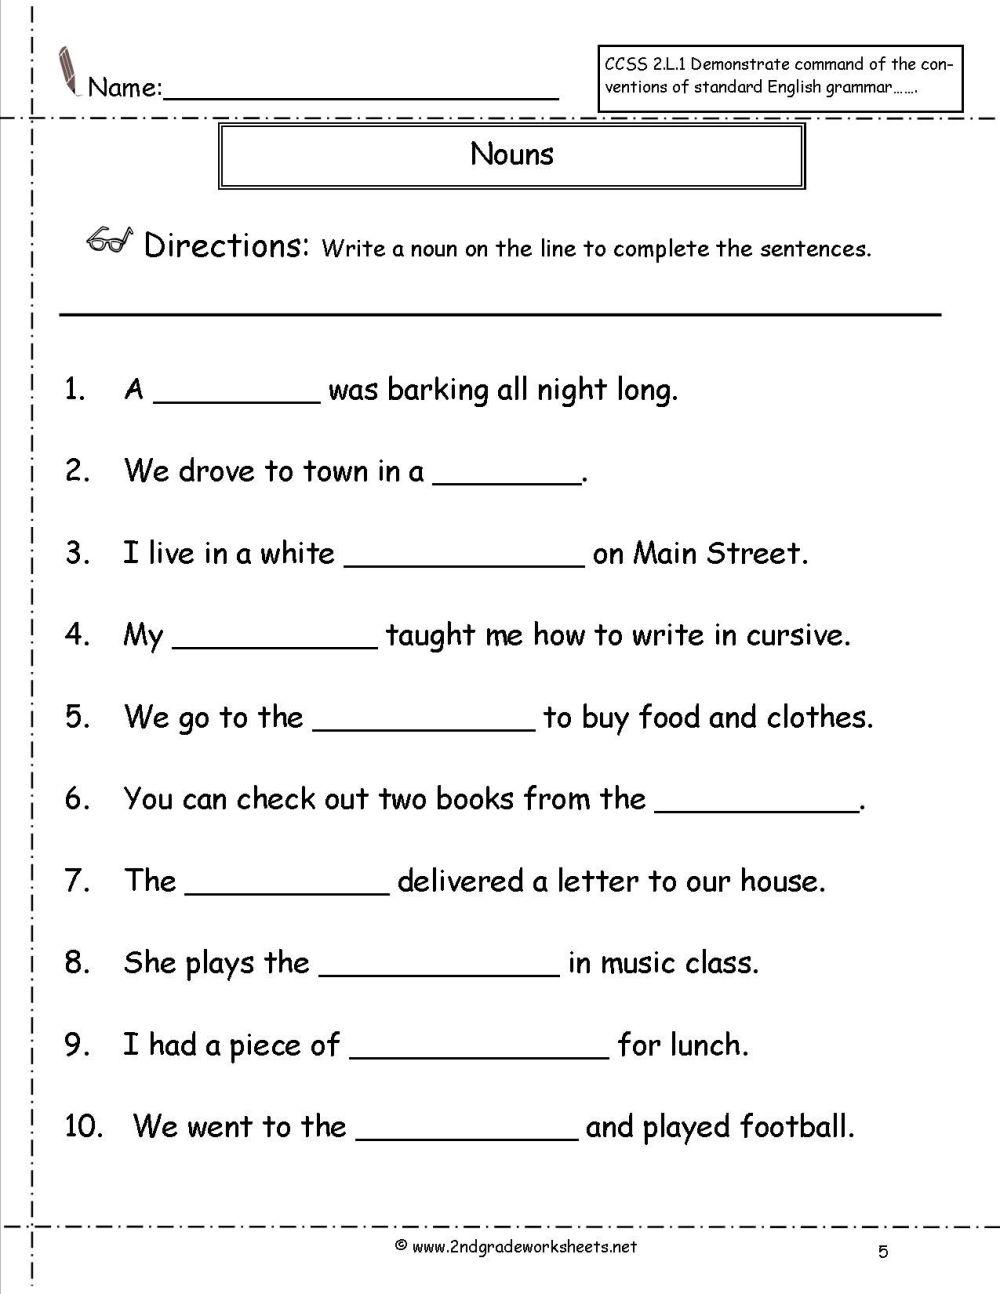 medium resolution of English Grammar Noun Worksheet For Grade 1 Elegant Nouns Worksheets on Best  Worksheets Collection 6616